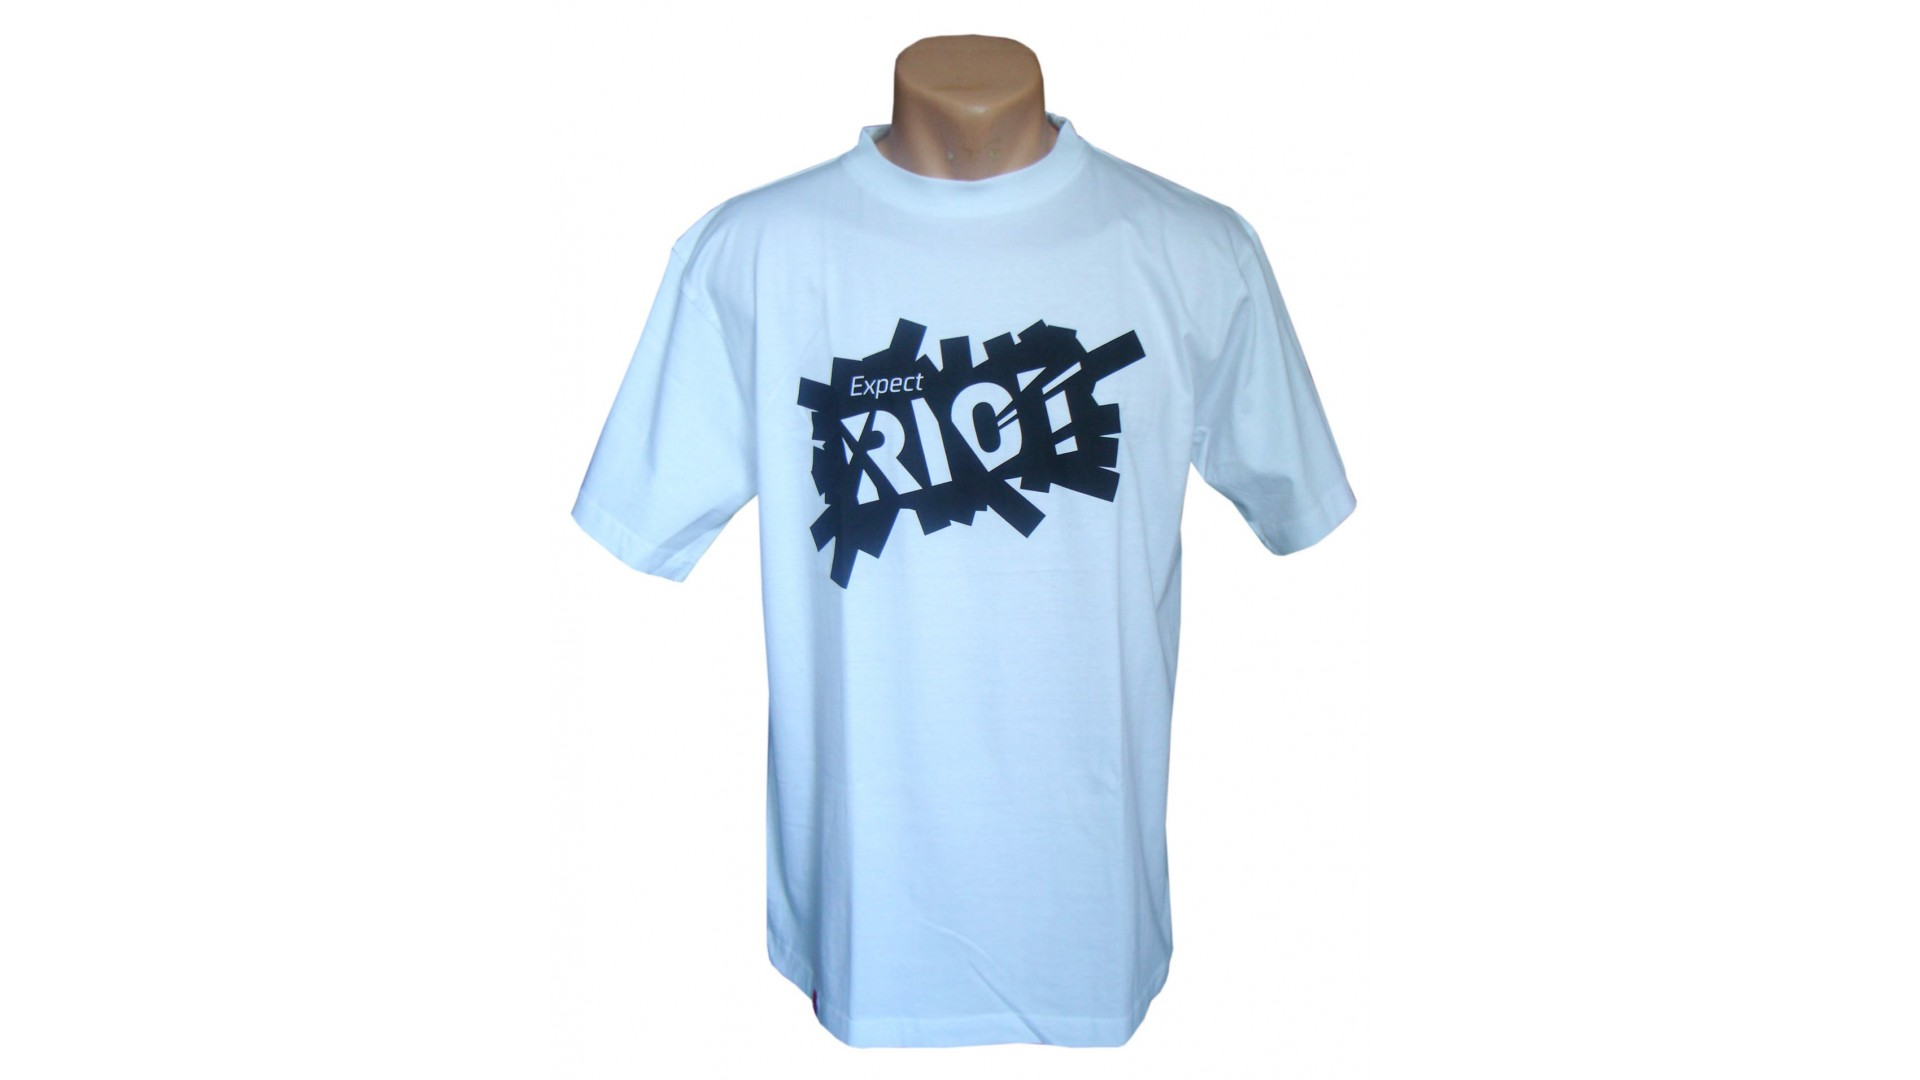 Футболка Ghost T-shirt white год 2015